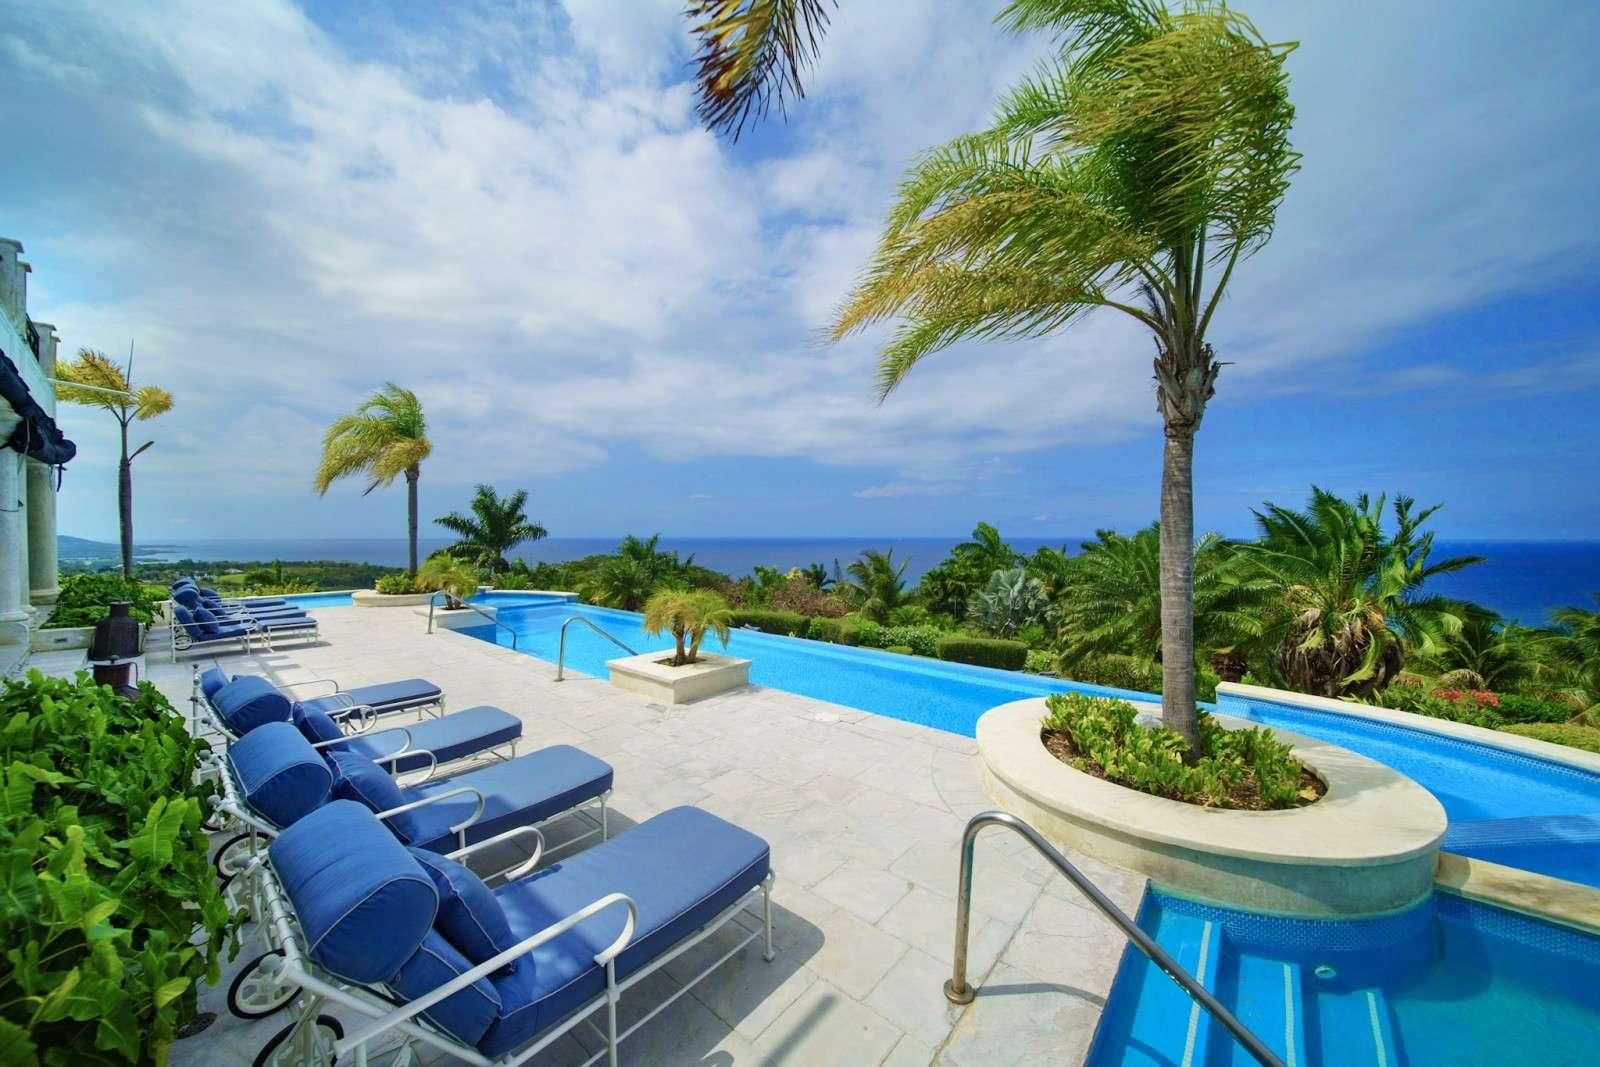 Luxury villa rentals caribbean - Jamaica - Try all club - No location 4 - Villa Twin Palms - Image 1/17